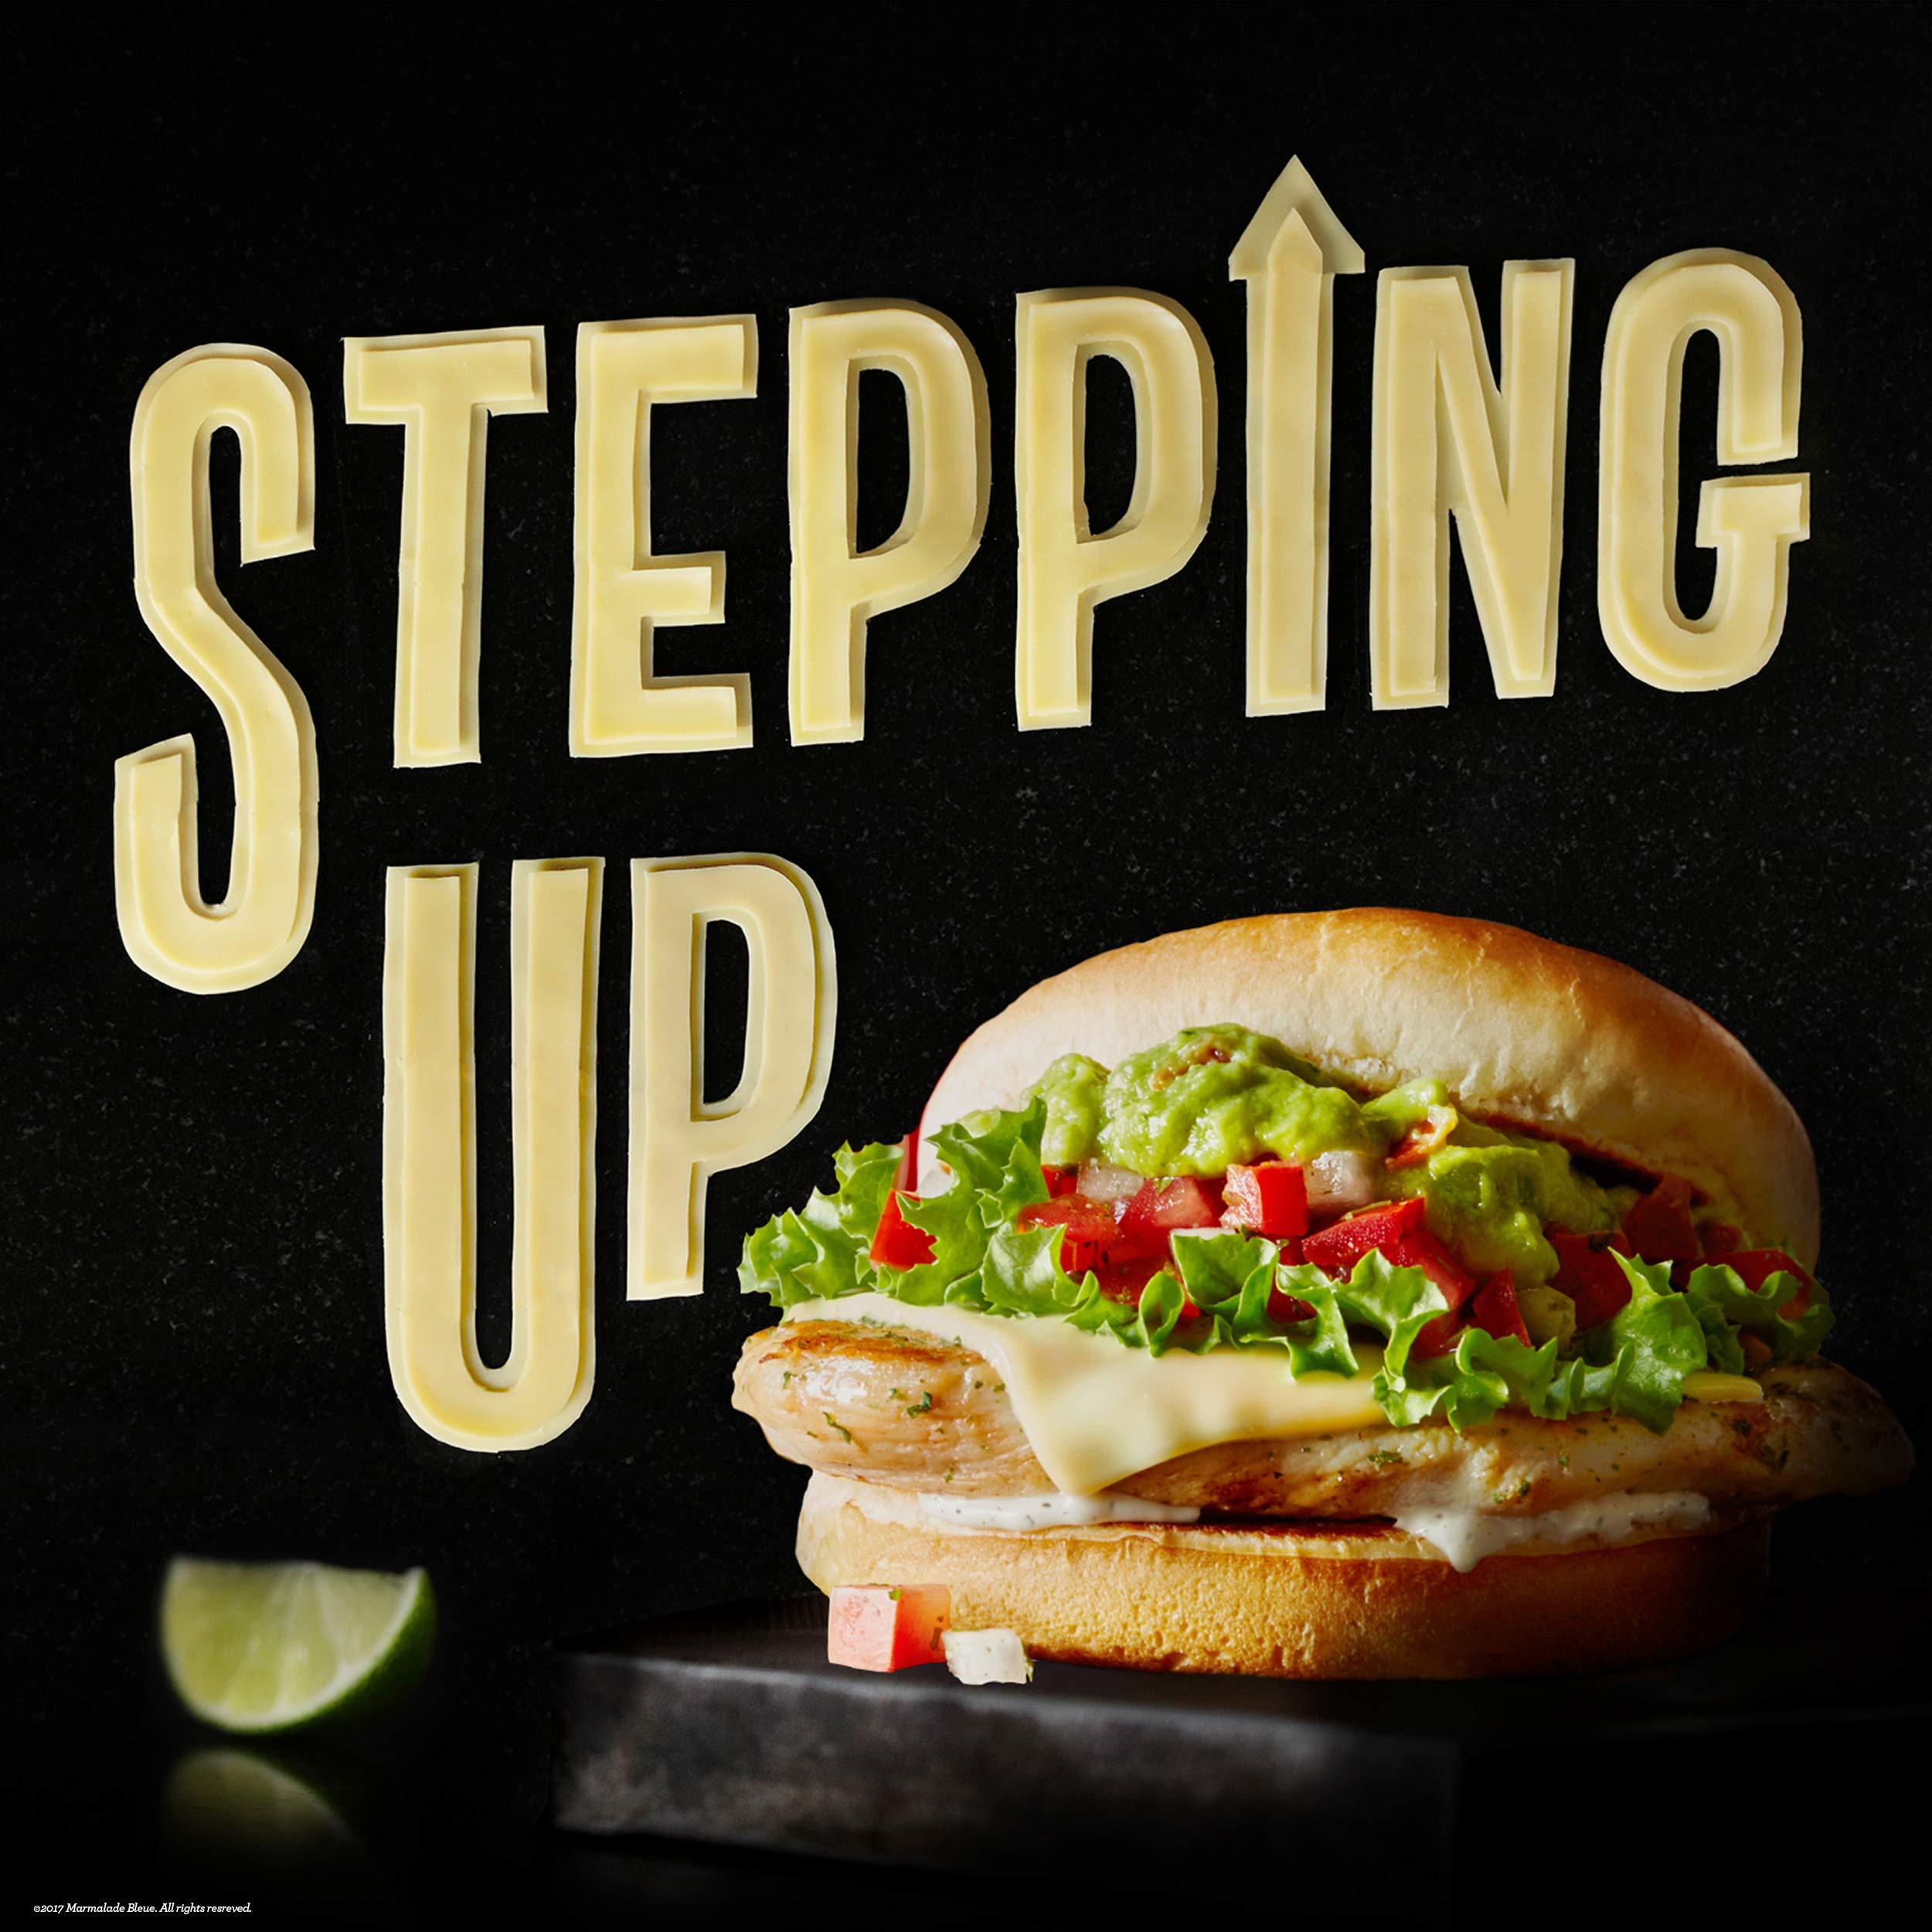 Food Lettering + McDonald's